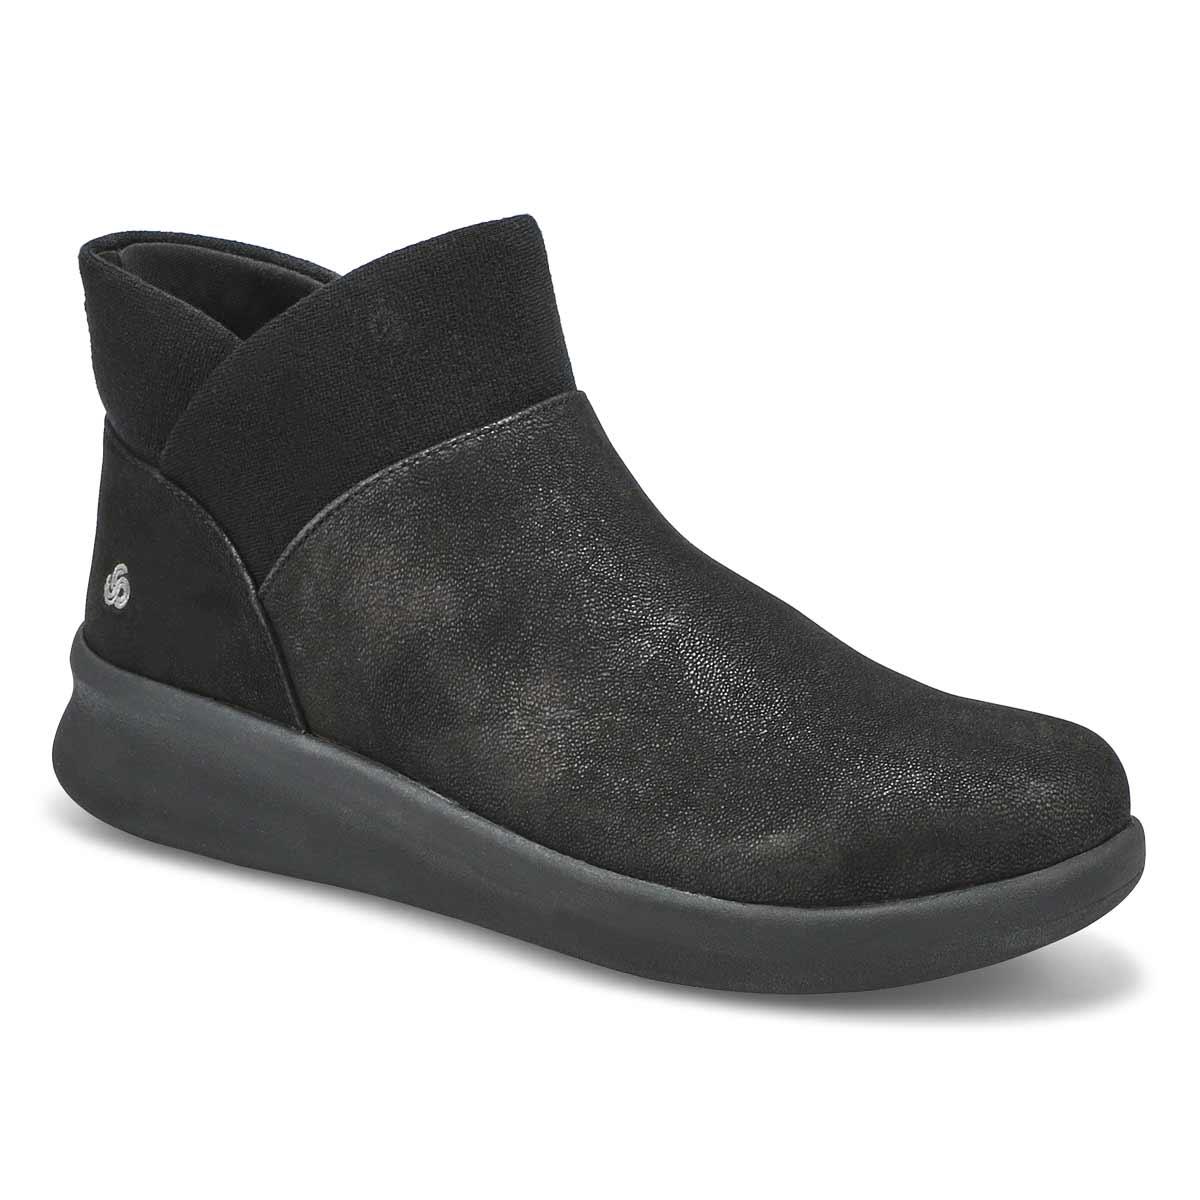 Women's Sillian 2.0 Dusk Casual Boot - Black